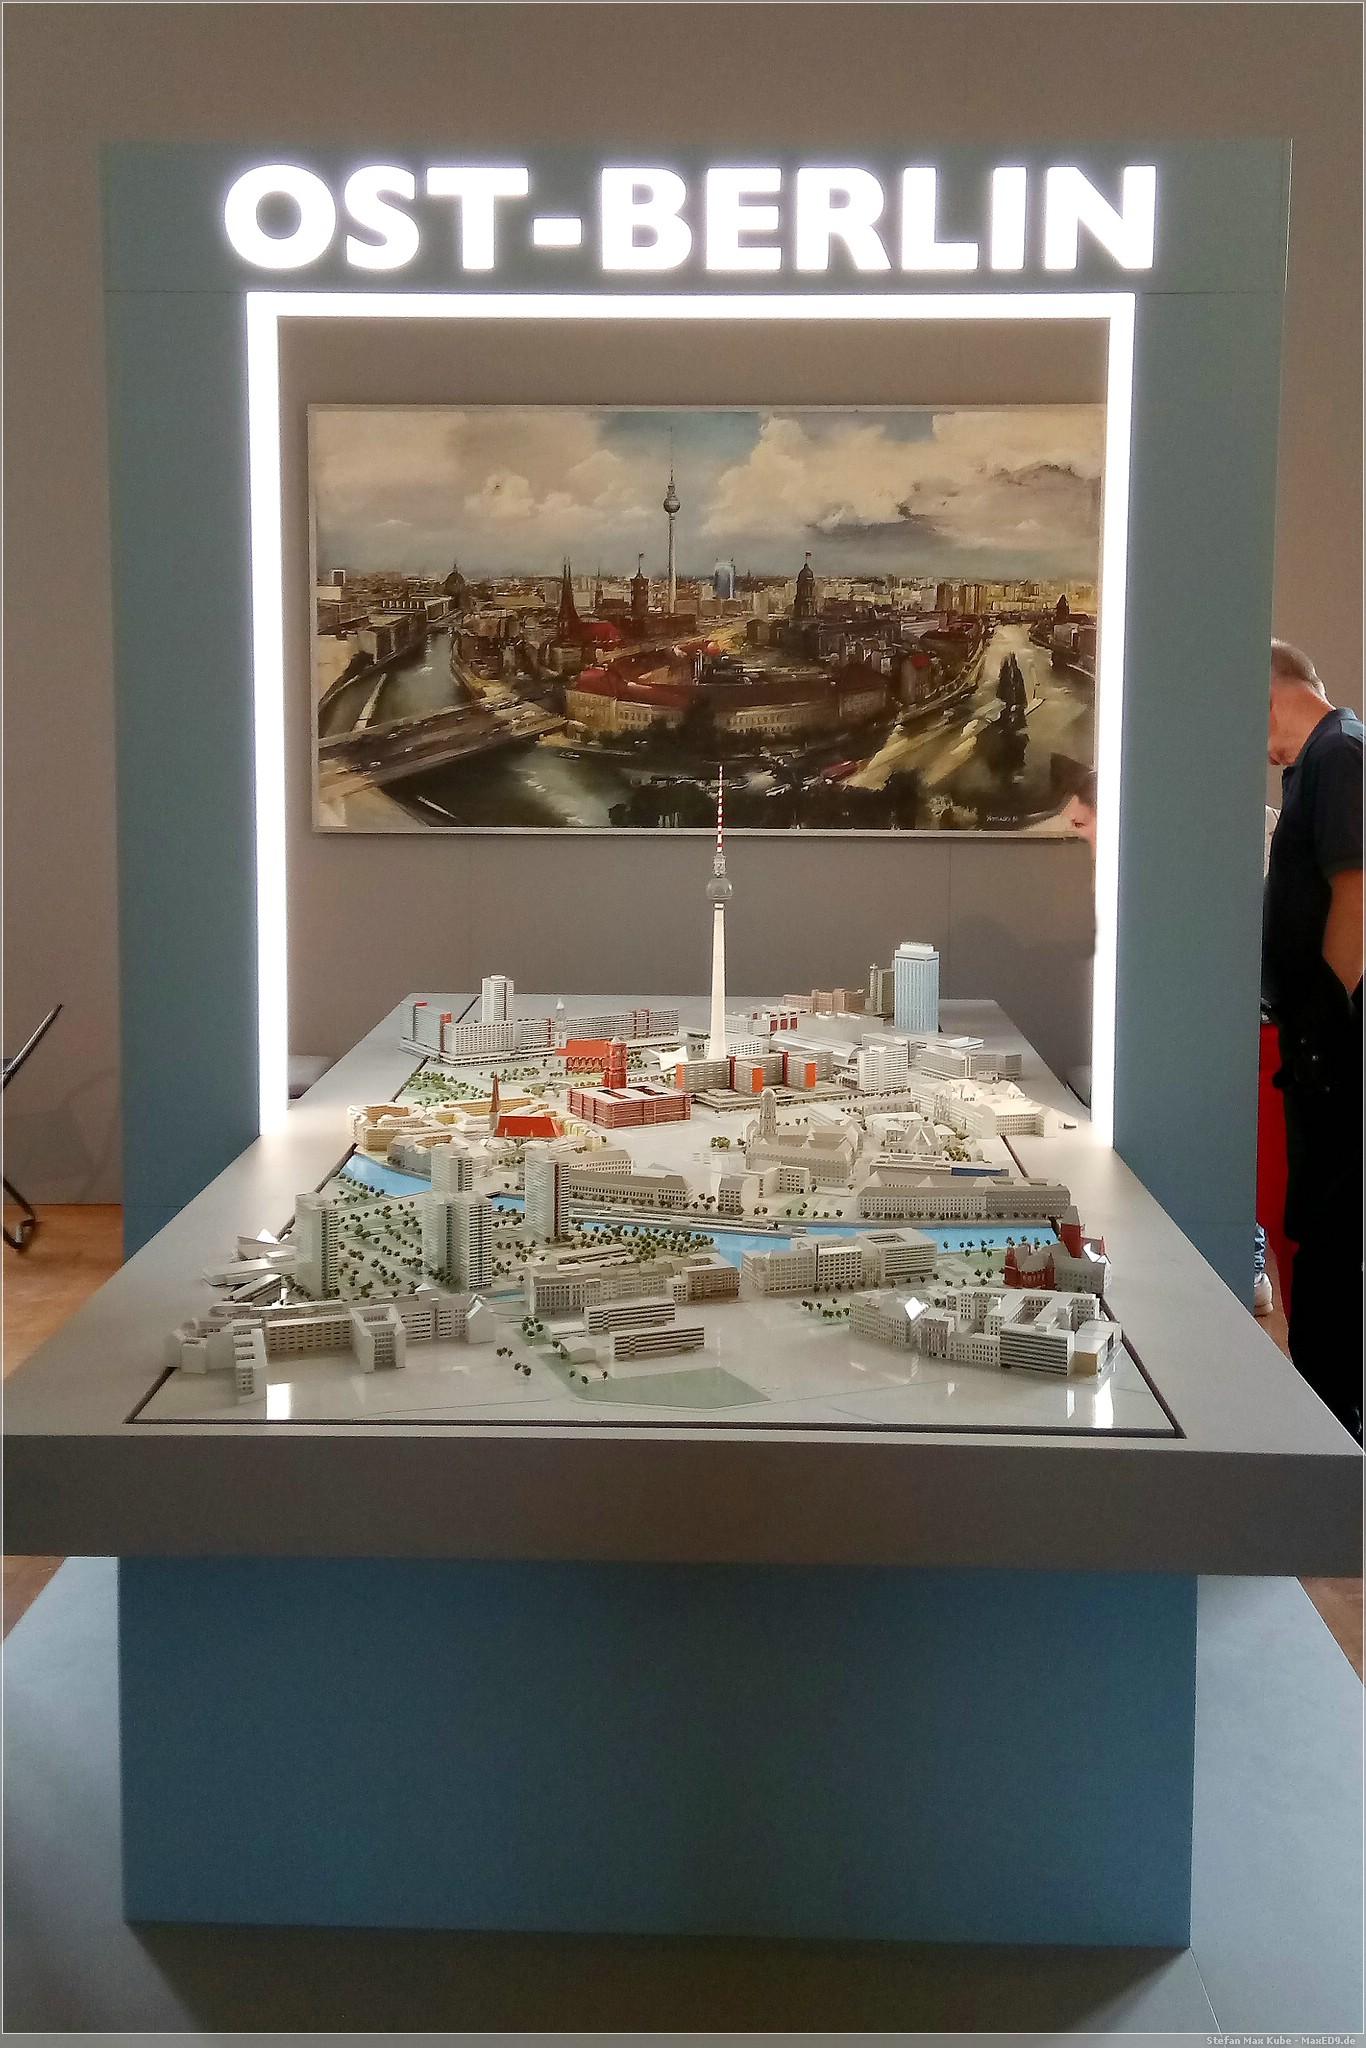 Modell der Innenstadt